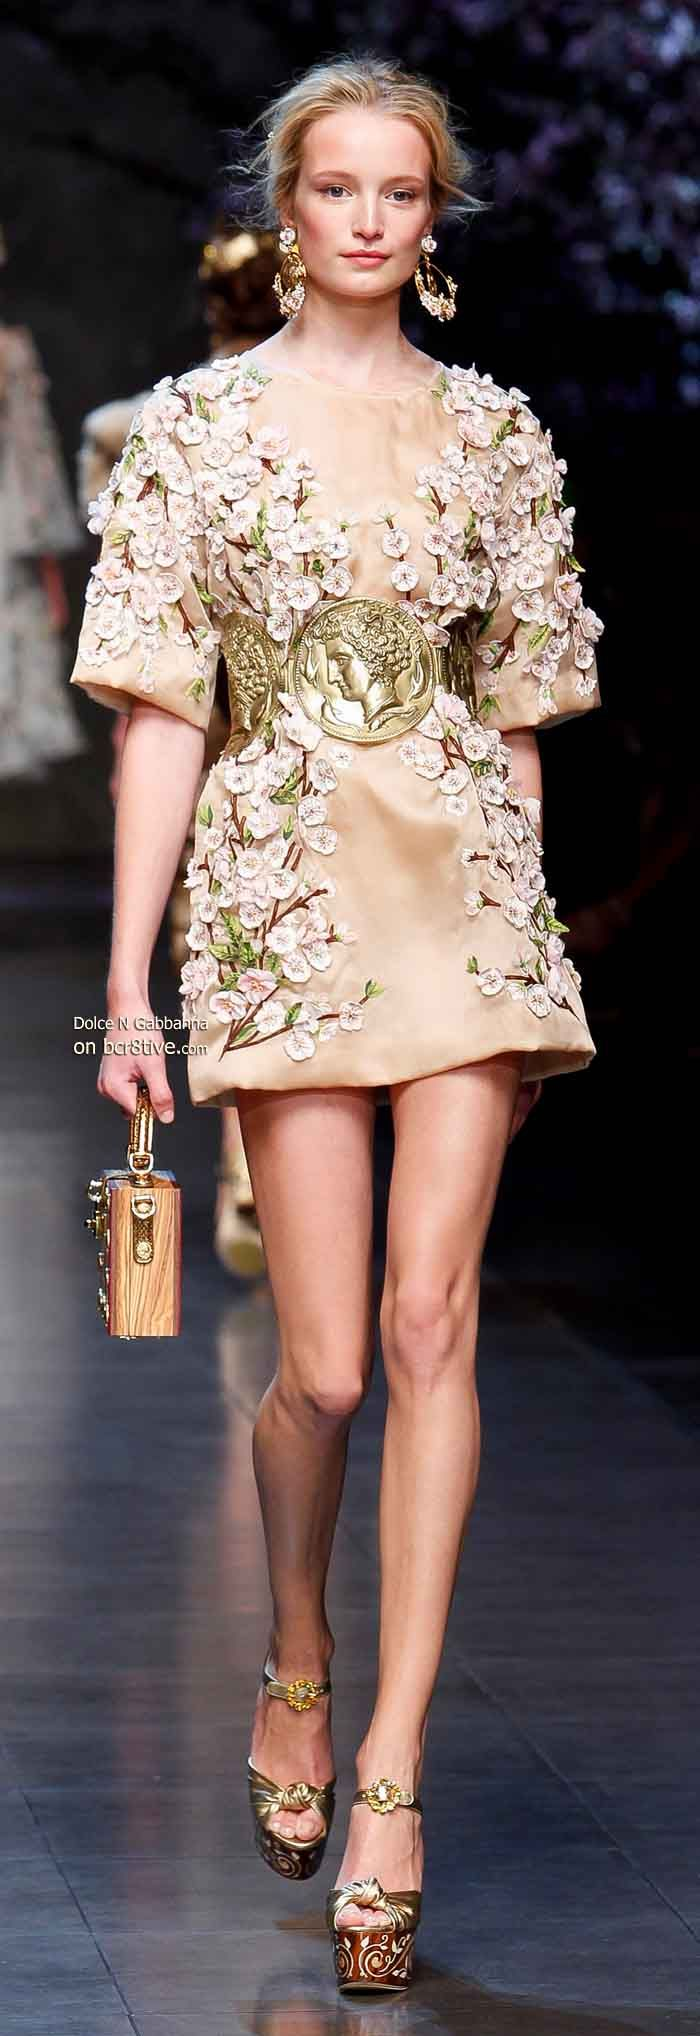 Dolce & Gabbana Spring 2014  Roman inspiration